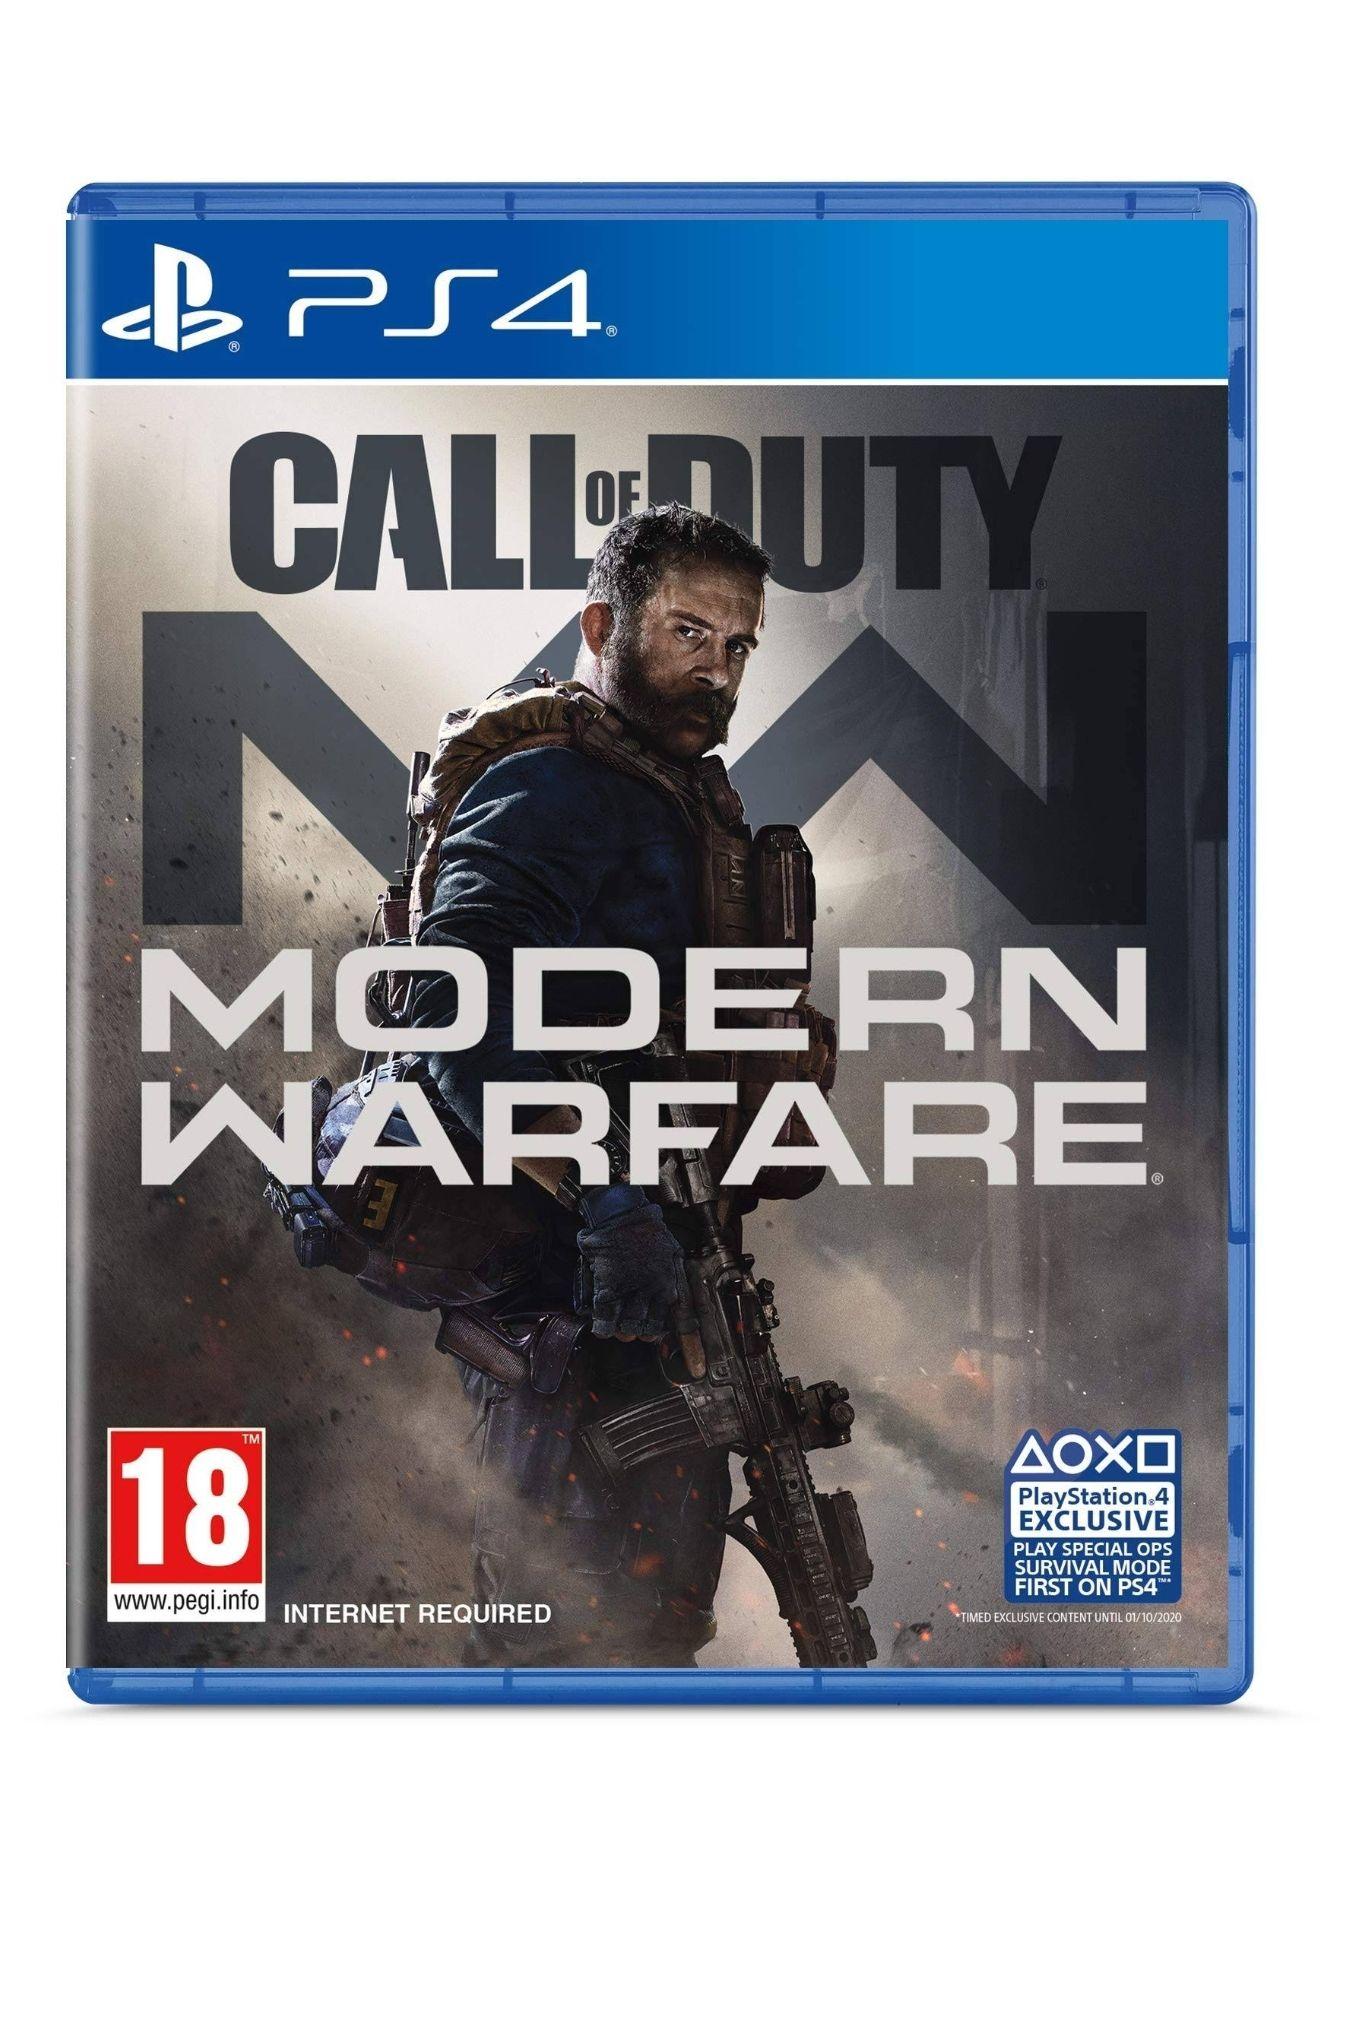 Call of duty Modern Warfare - PS4 / Xbox 1 - £35 @ Tesco